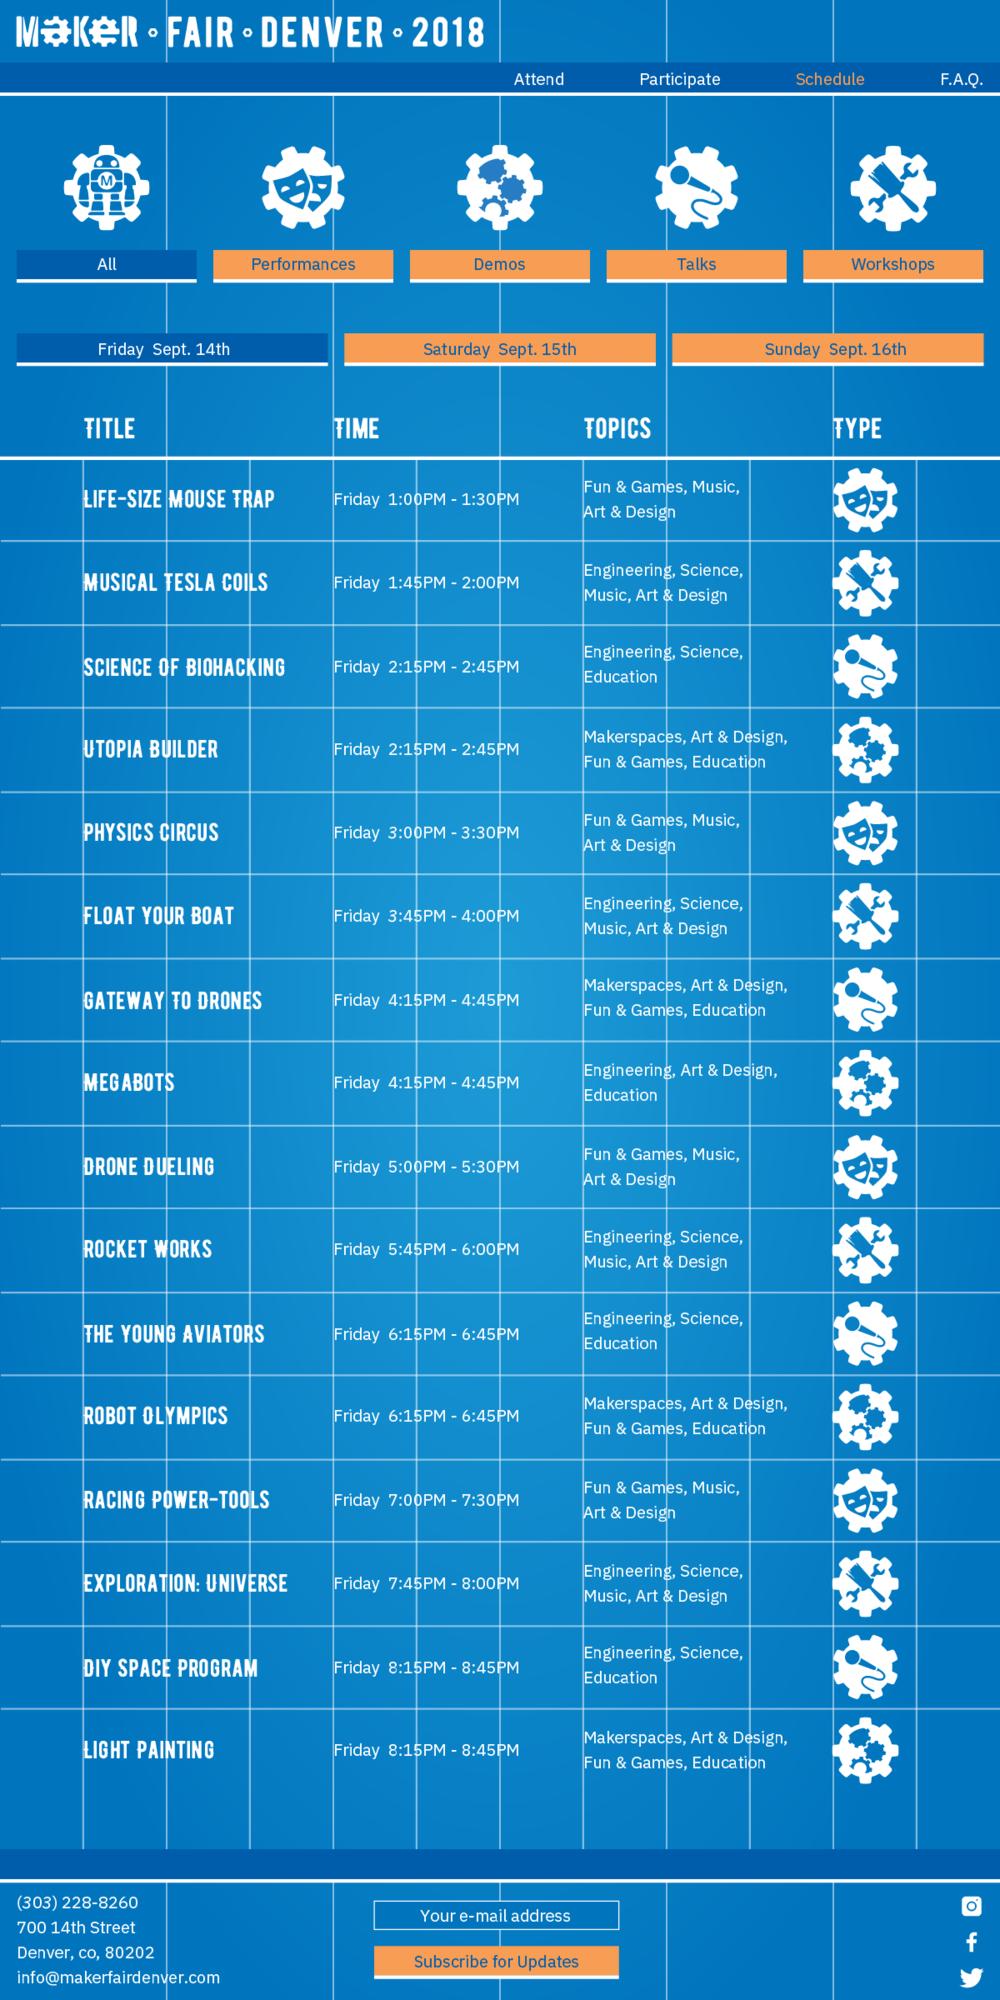 makerfair_desktop_schedulepage.png